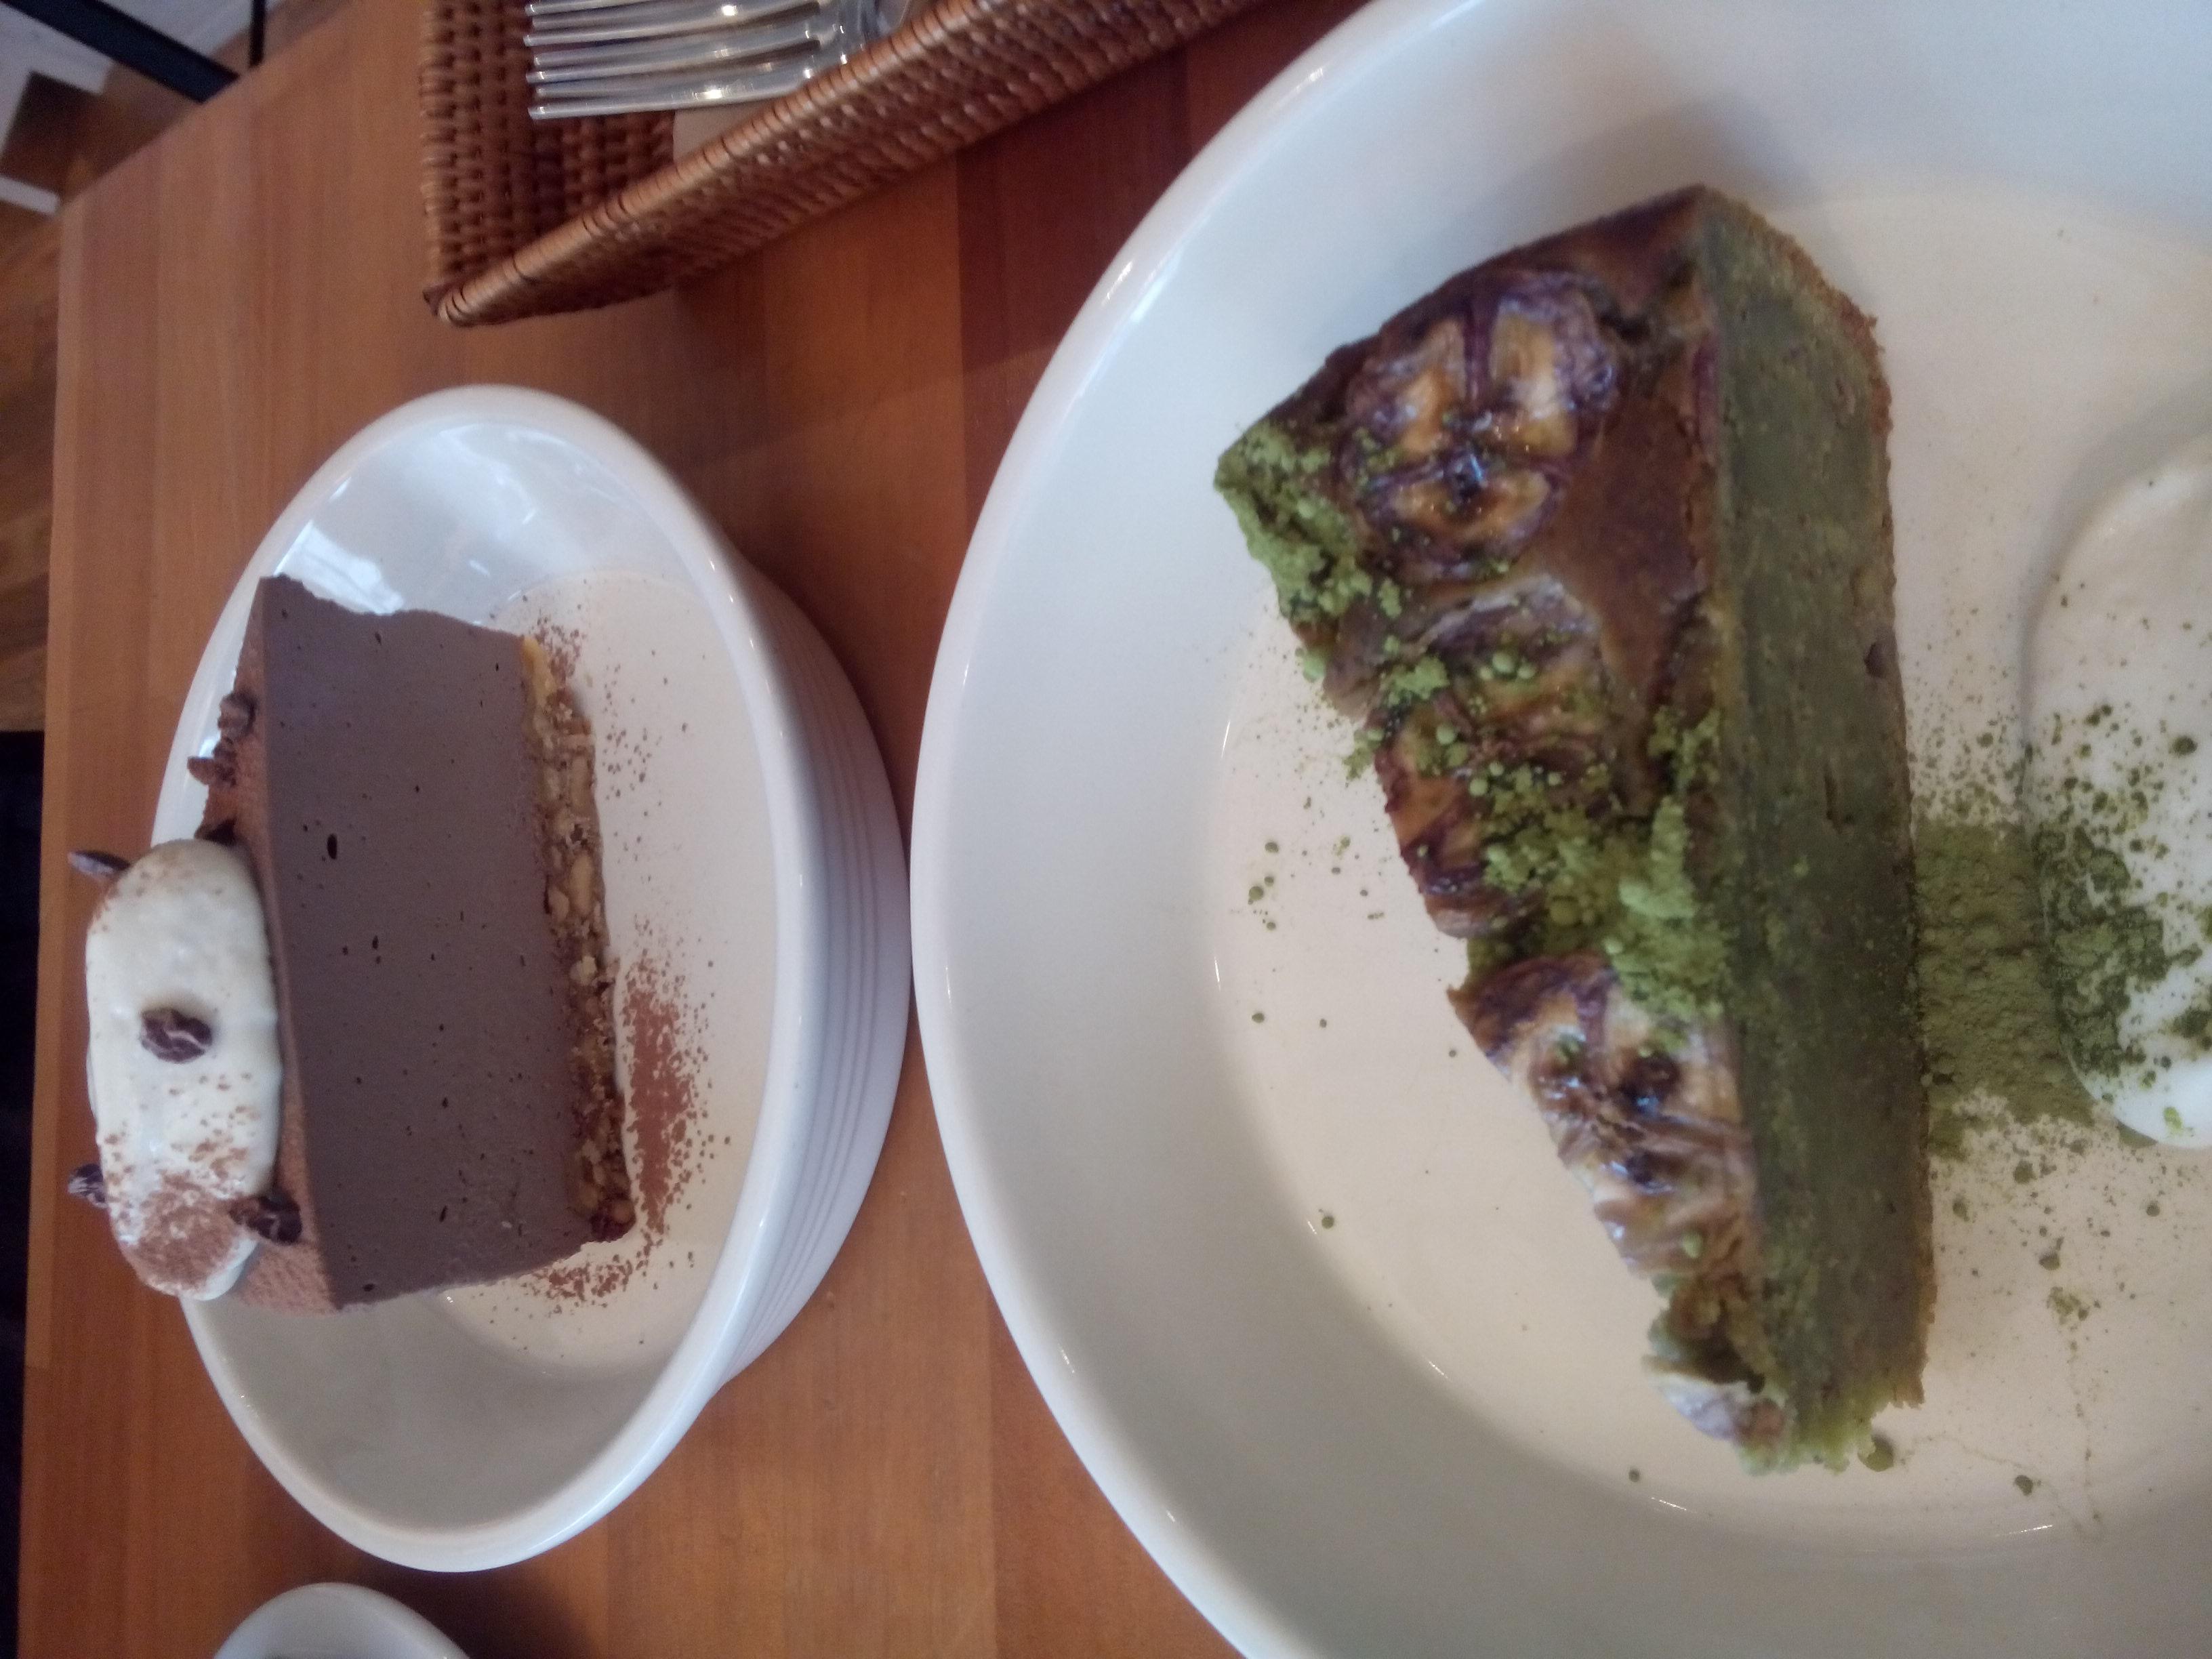 Banana chocolate cake and coconut mousse cake